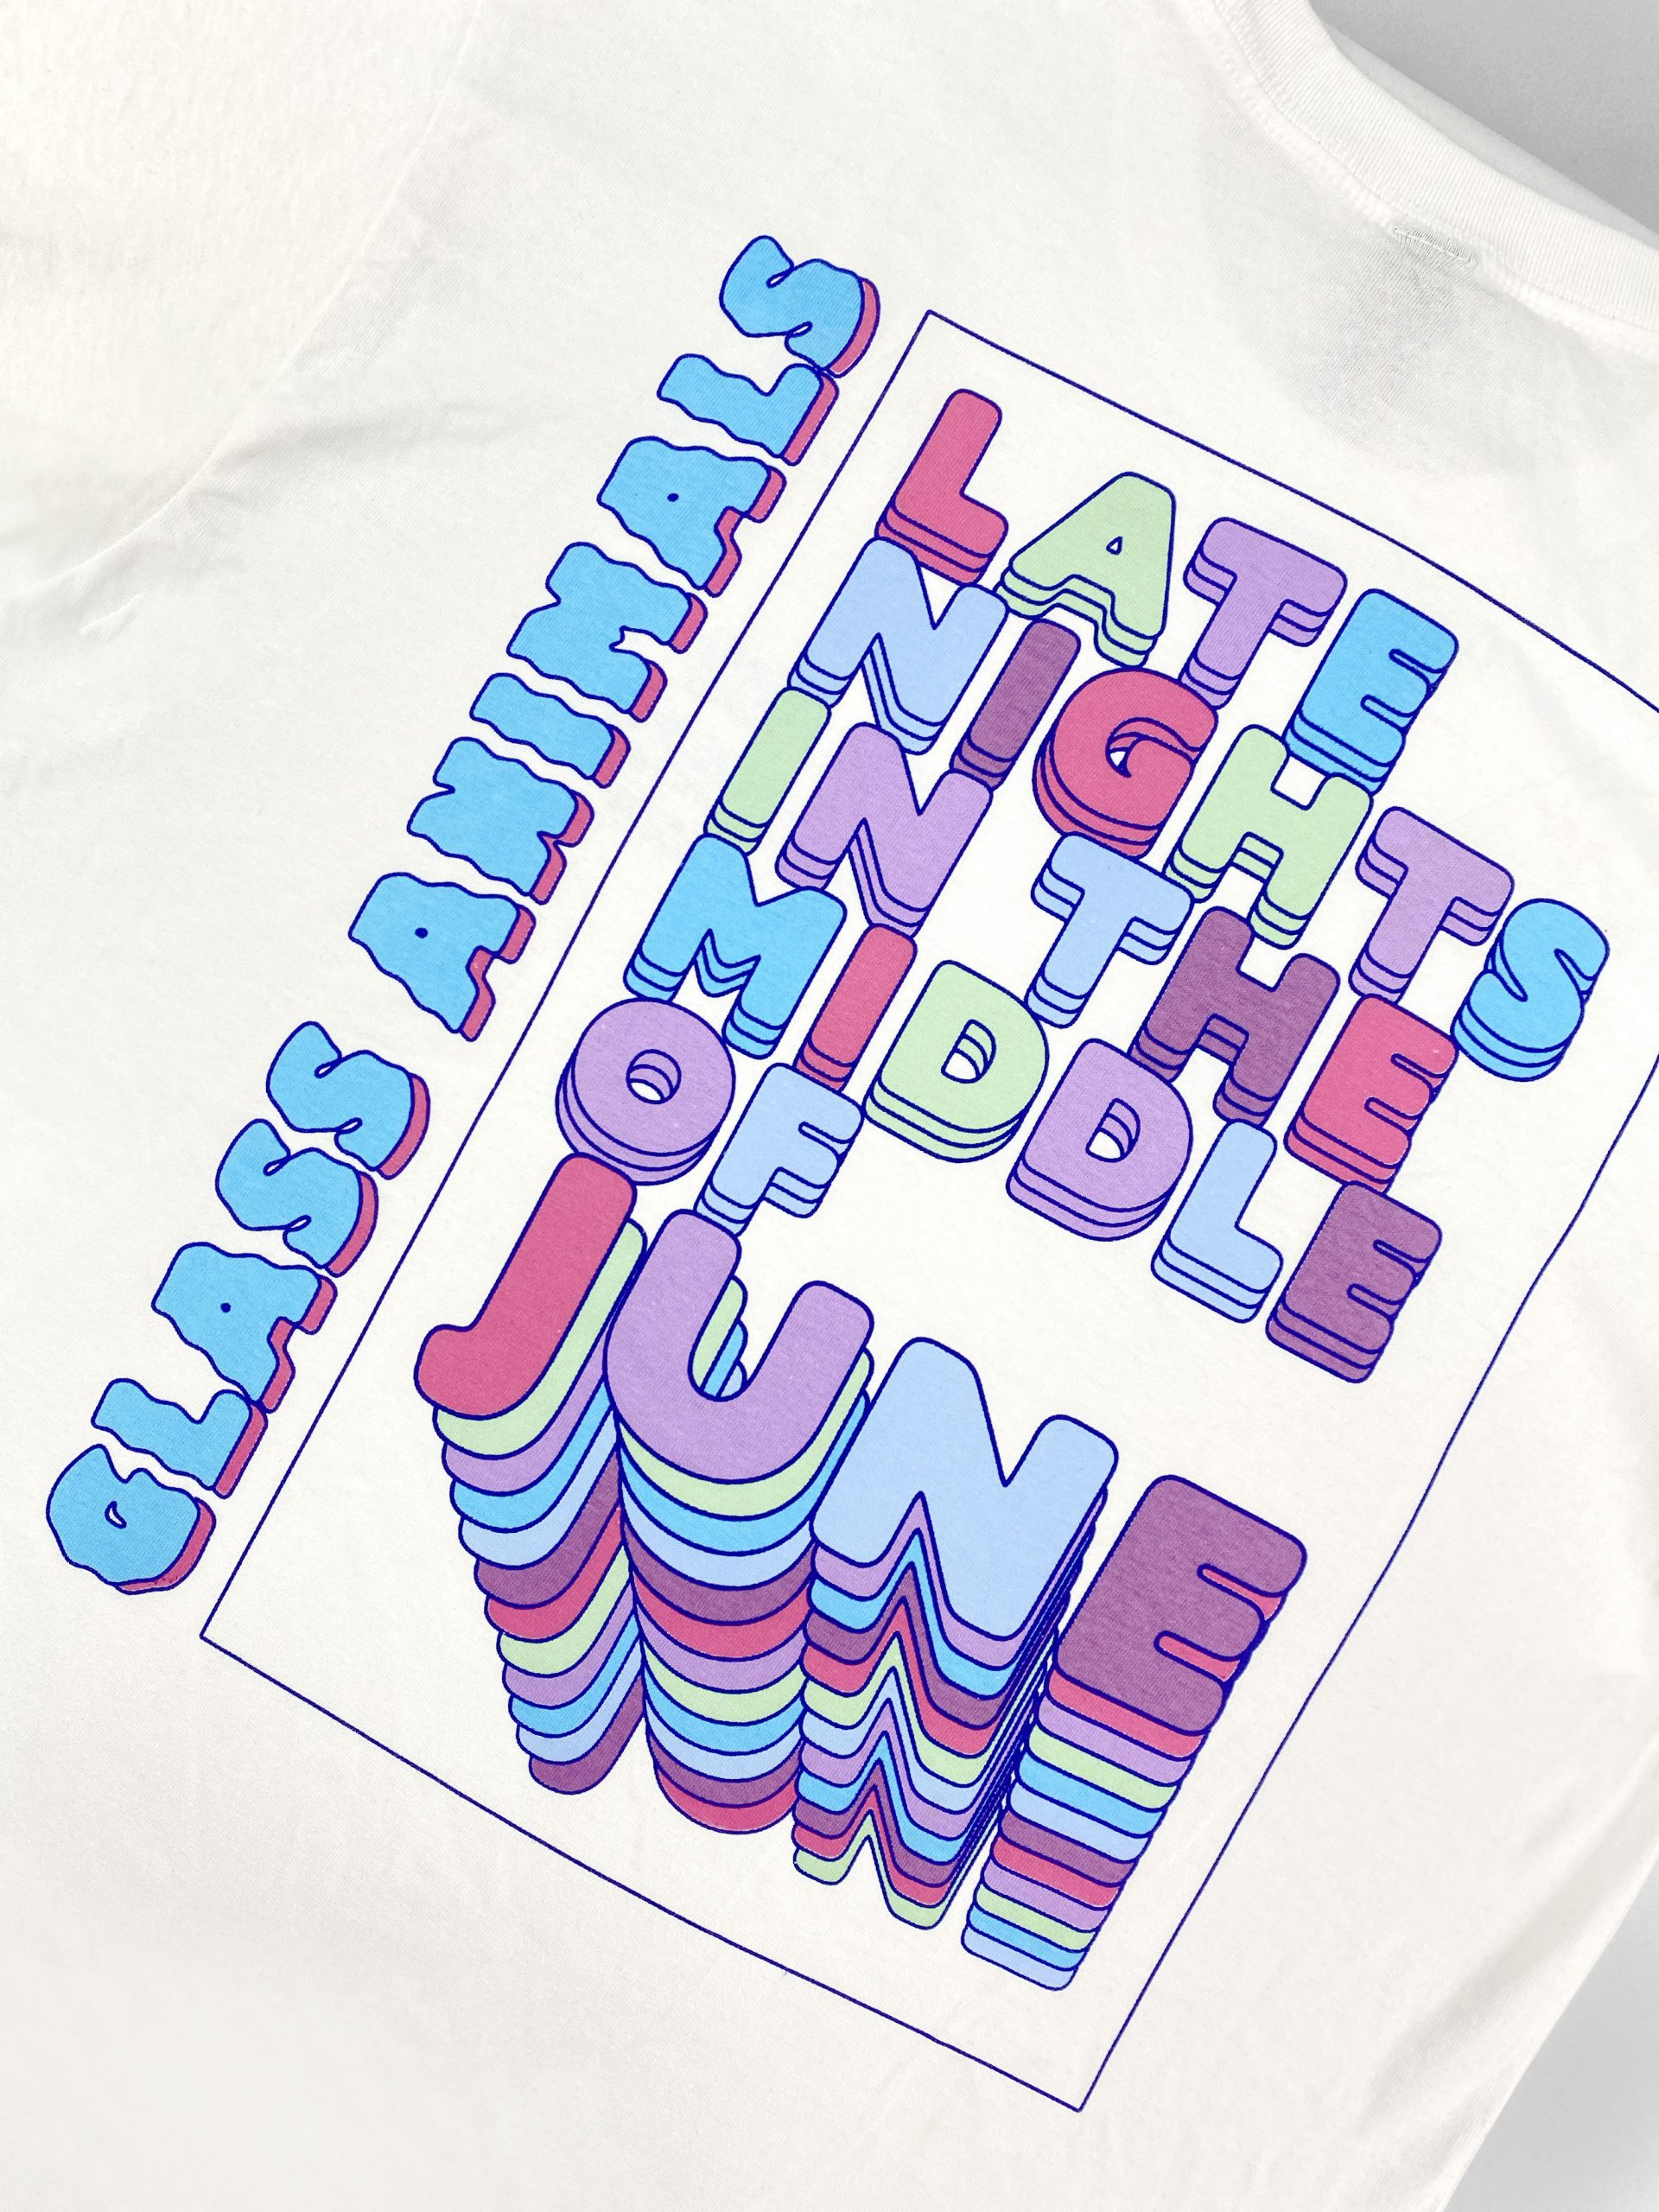 Glass Animals screen printed t-shirt lead image